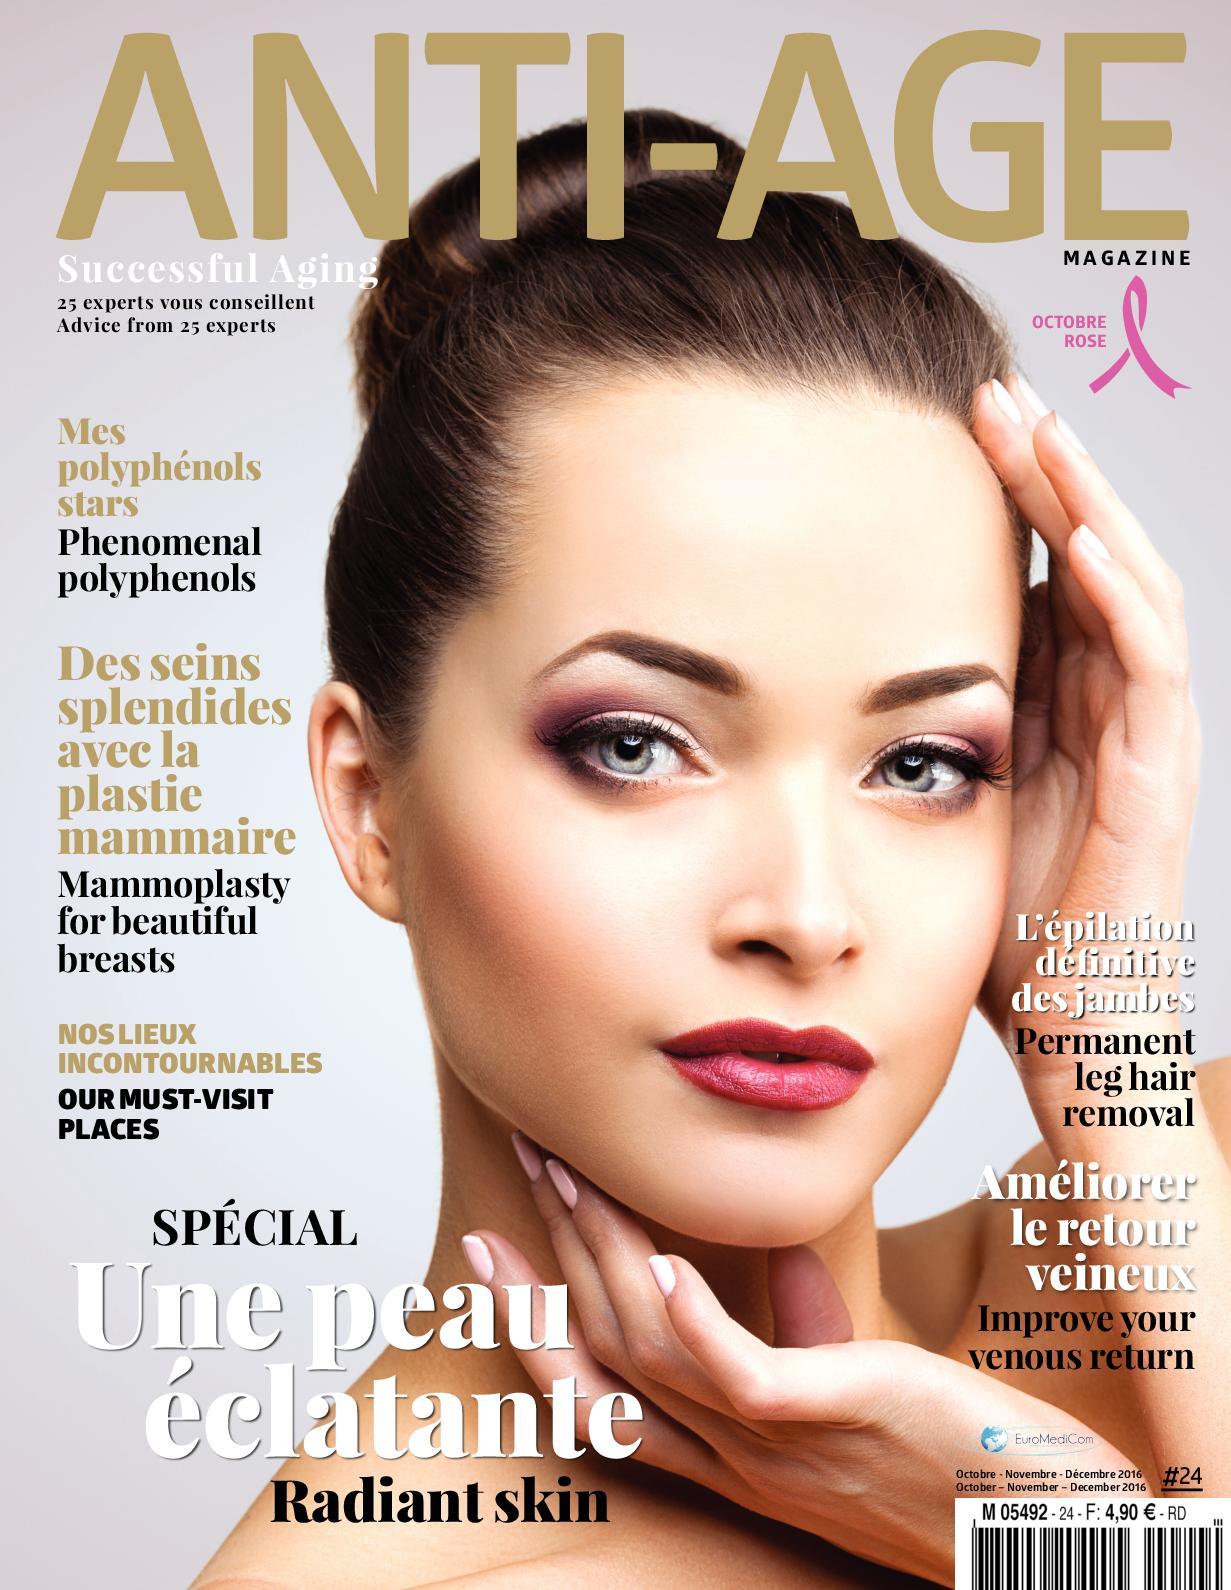 Calaméo Age24 Anti Revista Age24 Revista Anti Calaméo QWdrCoEBex